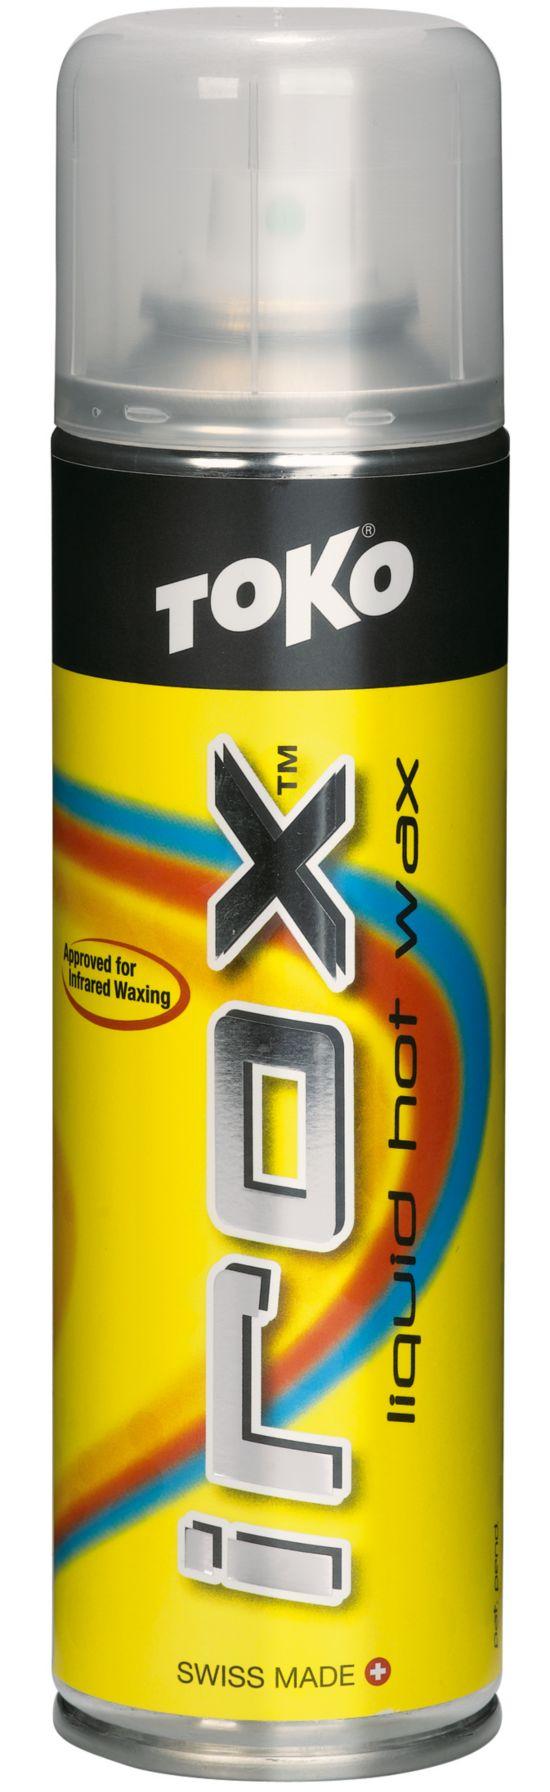 Irox Sprayglider 250 ml